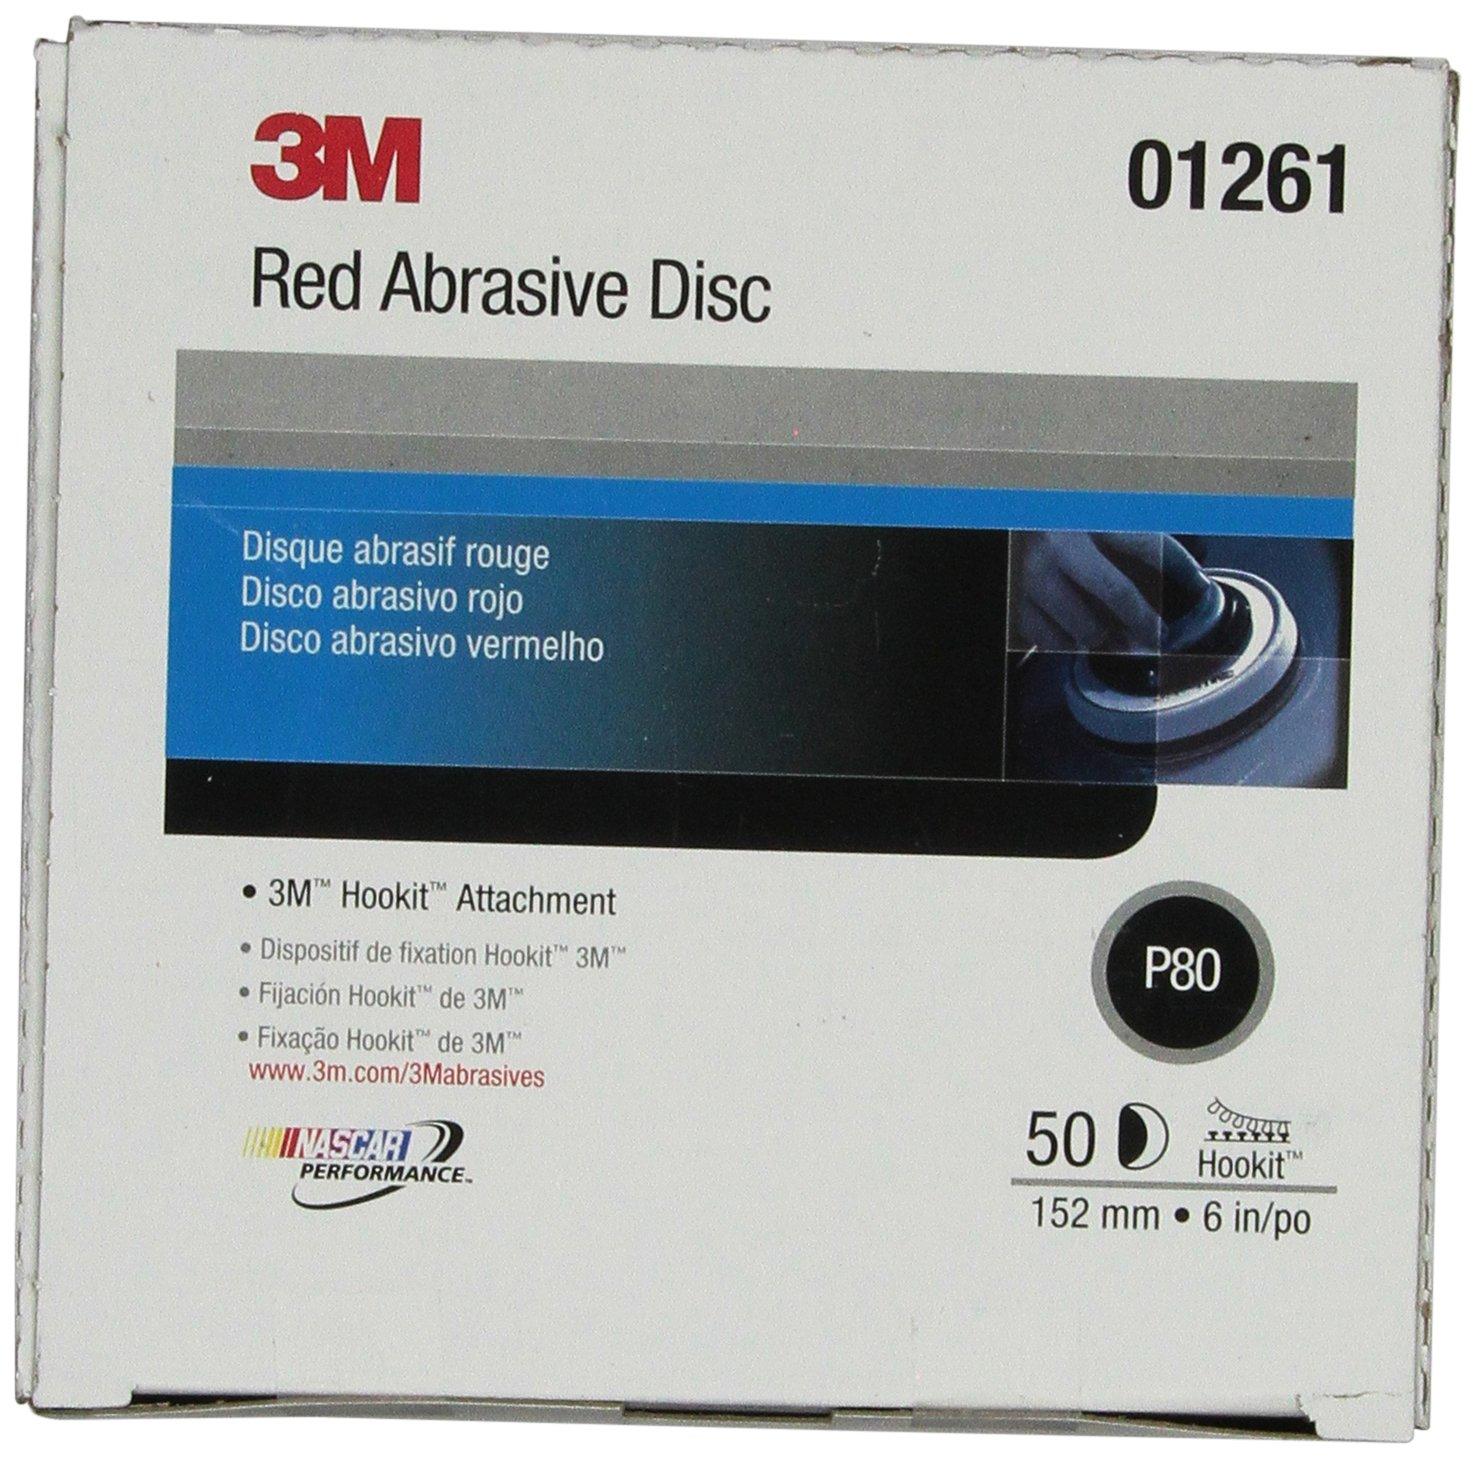 3M Hookit Red Abrasive Disc, 01261, 6 in, P80, 50 discs per carton